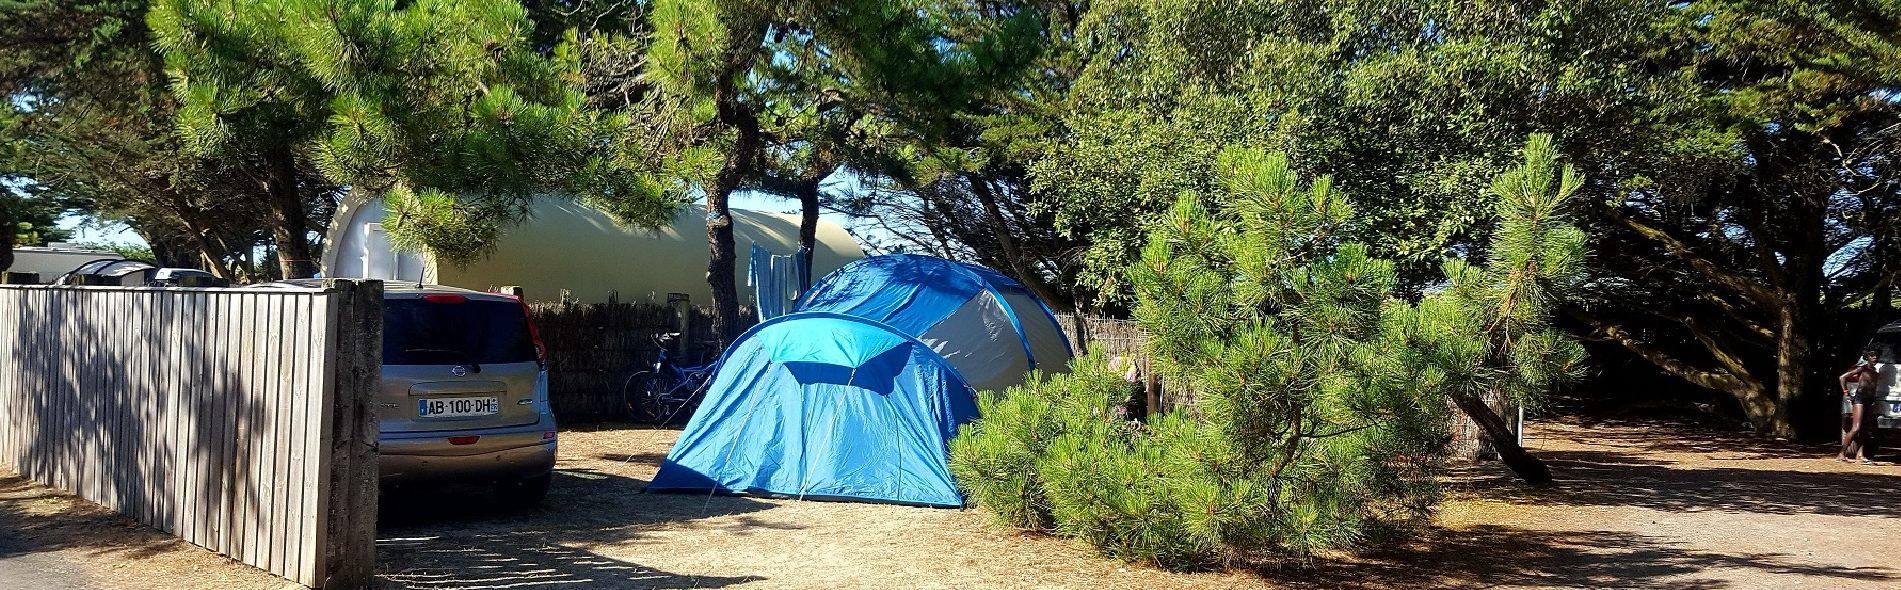 Camping Club Mahana : Tente 1920 Diapo